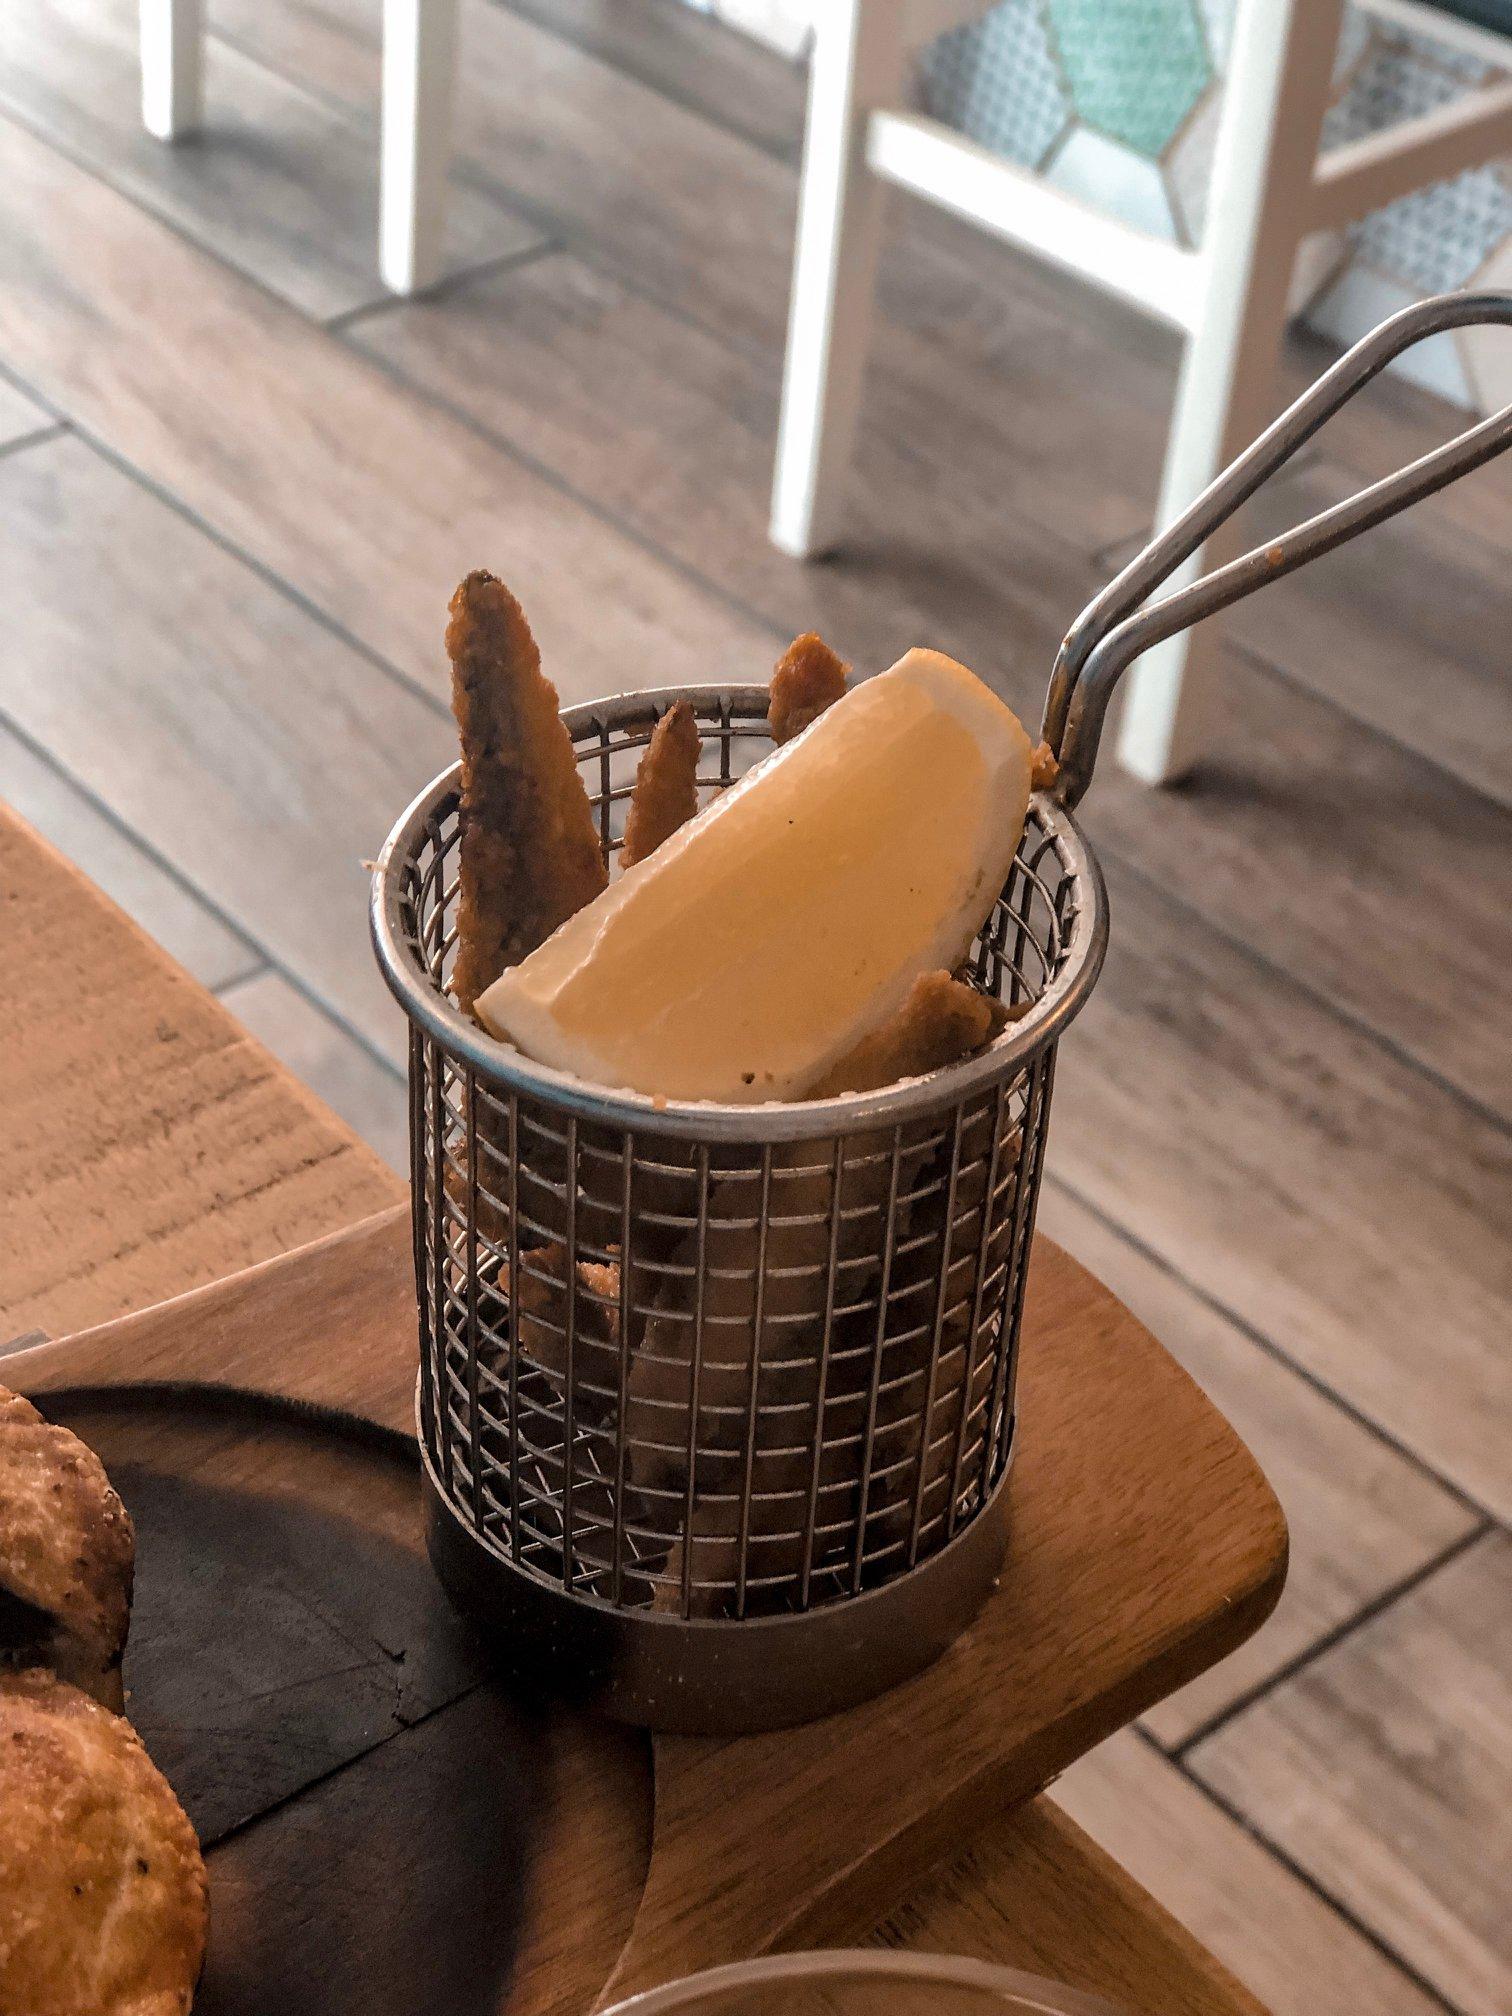 Bread & Pullet | Nicole Navigates